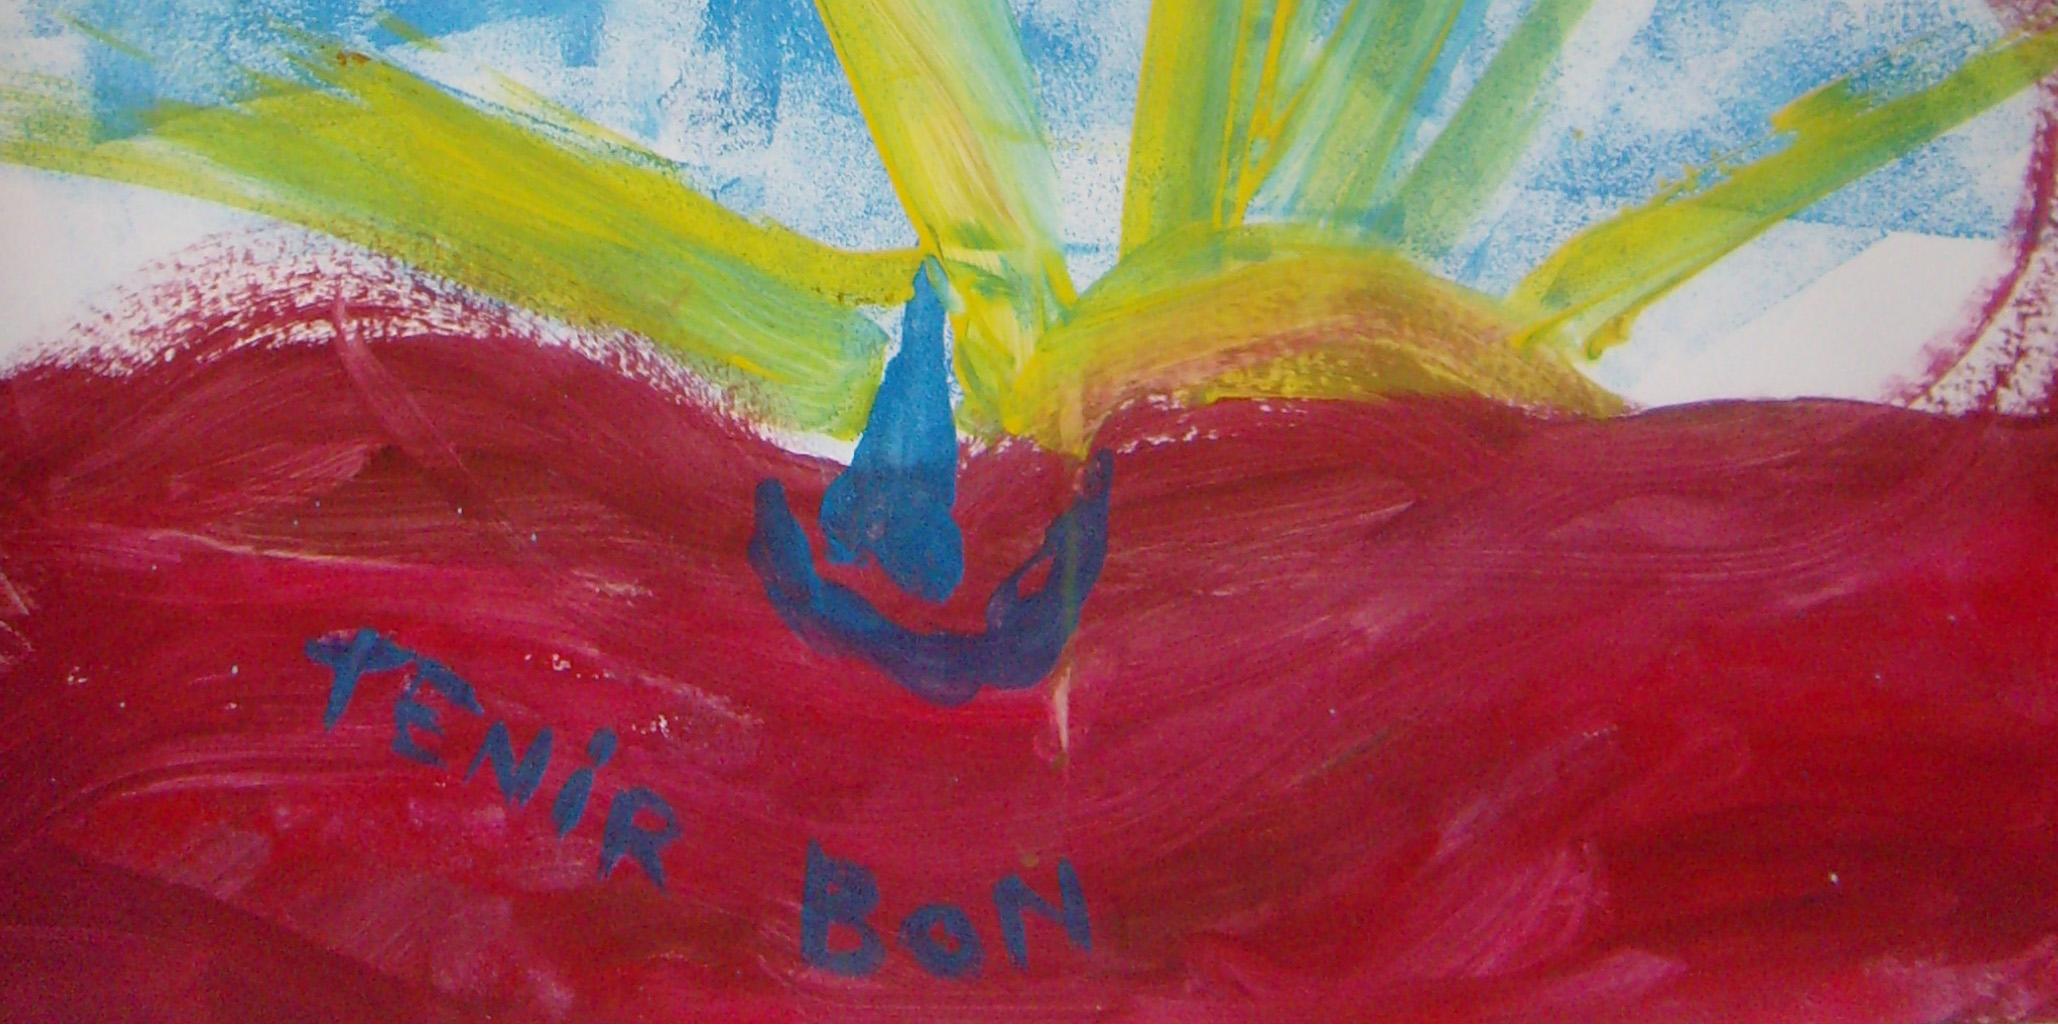 https://static.blog4ever.com/2013/04/737482/bateau-tenir-bn-soleil.jpg